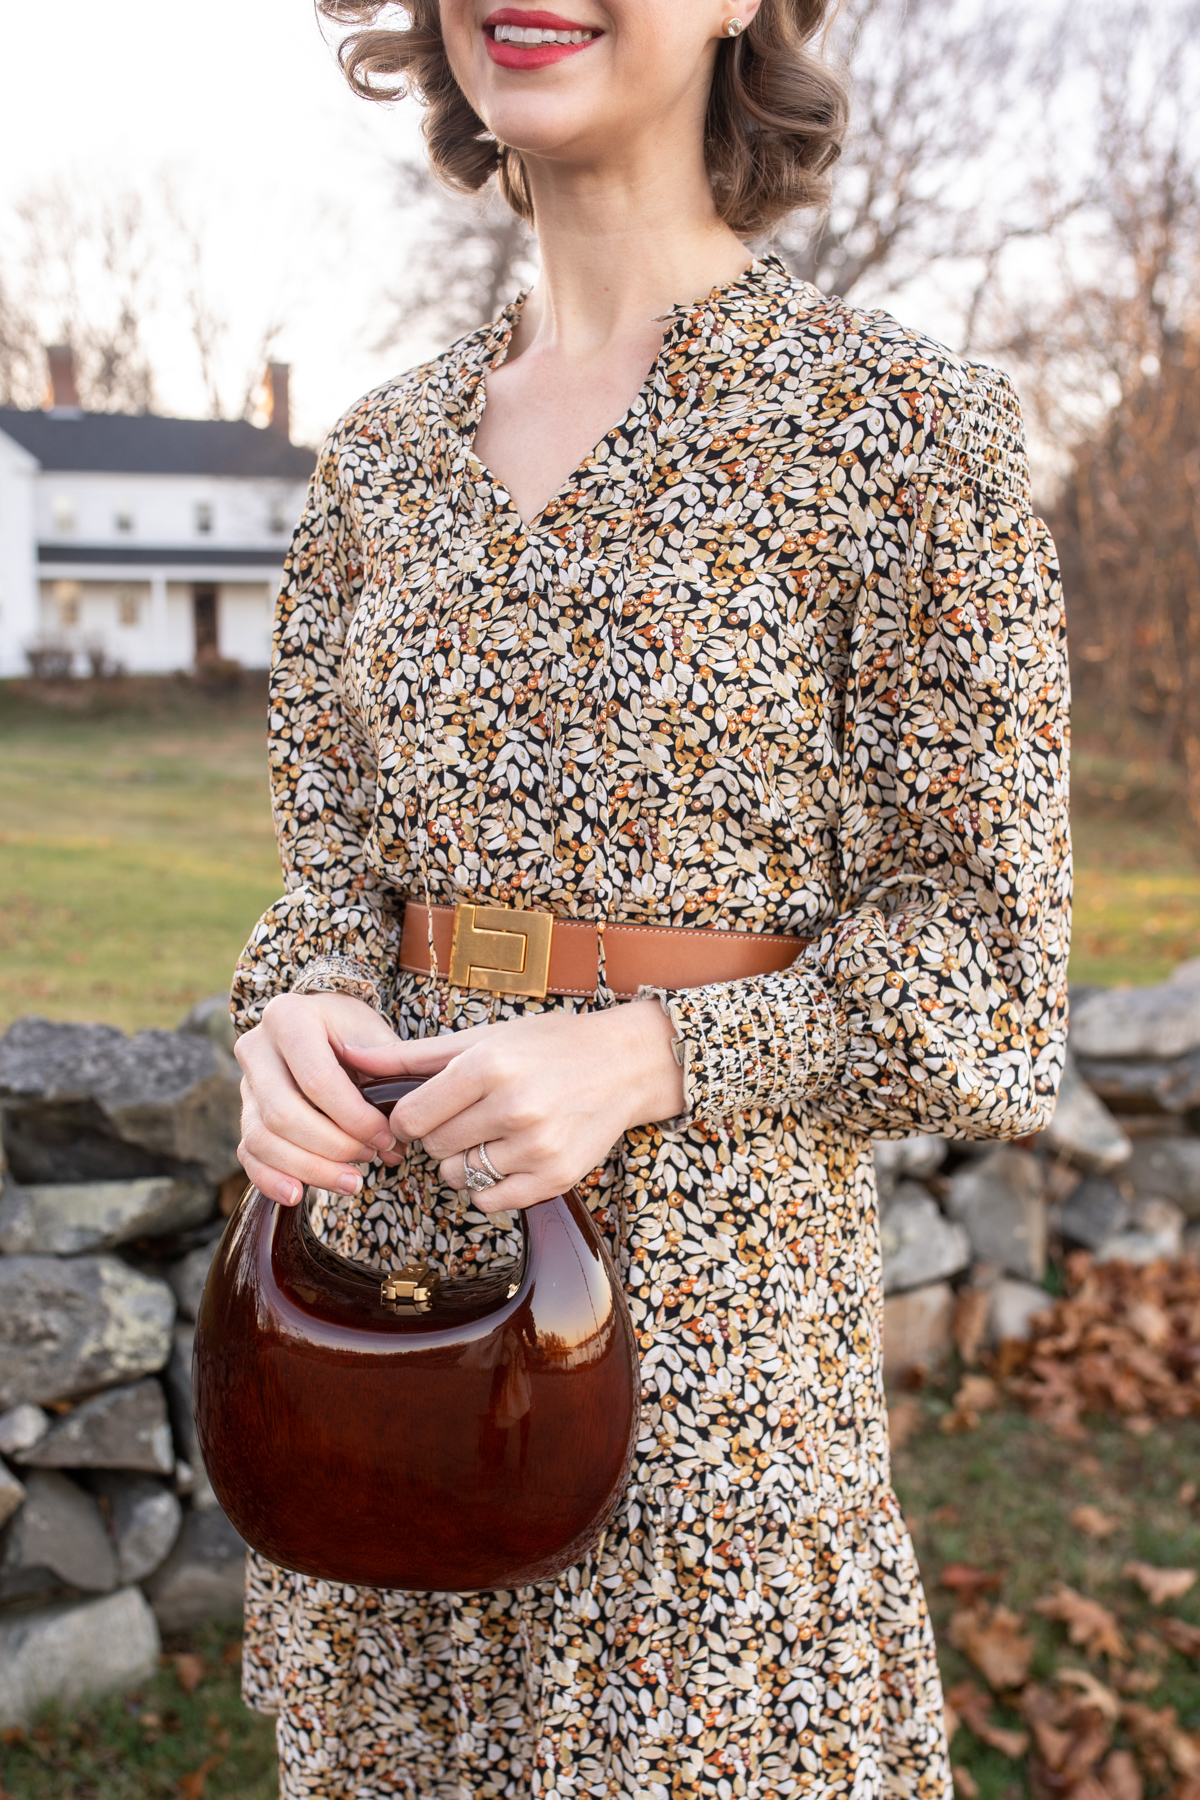 Stacie Flinner x Charlotte Brody Smocked Winterberry Dress-7.jpg